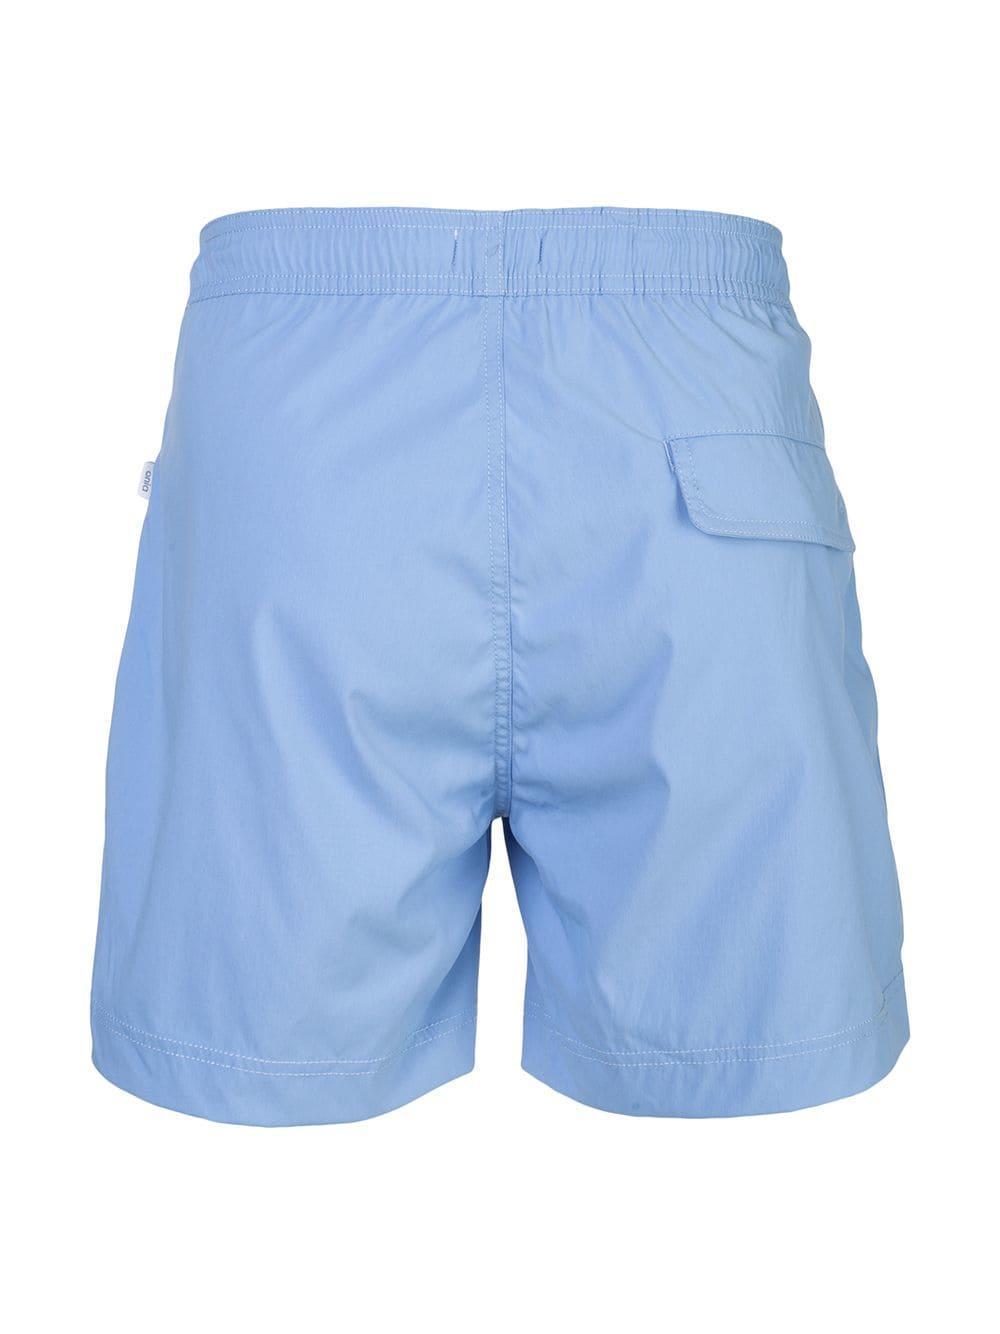 cce8d5d7dd Lyst - Onia Calder Swimming Trunks in Blue for Men